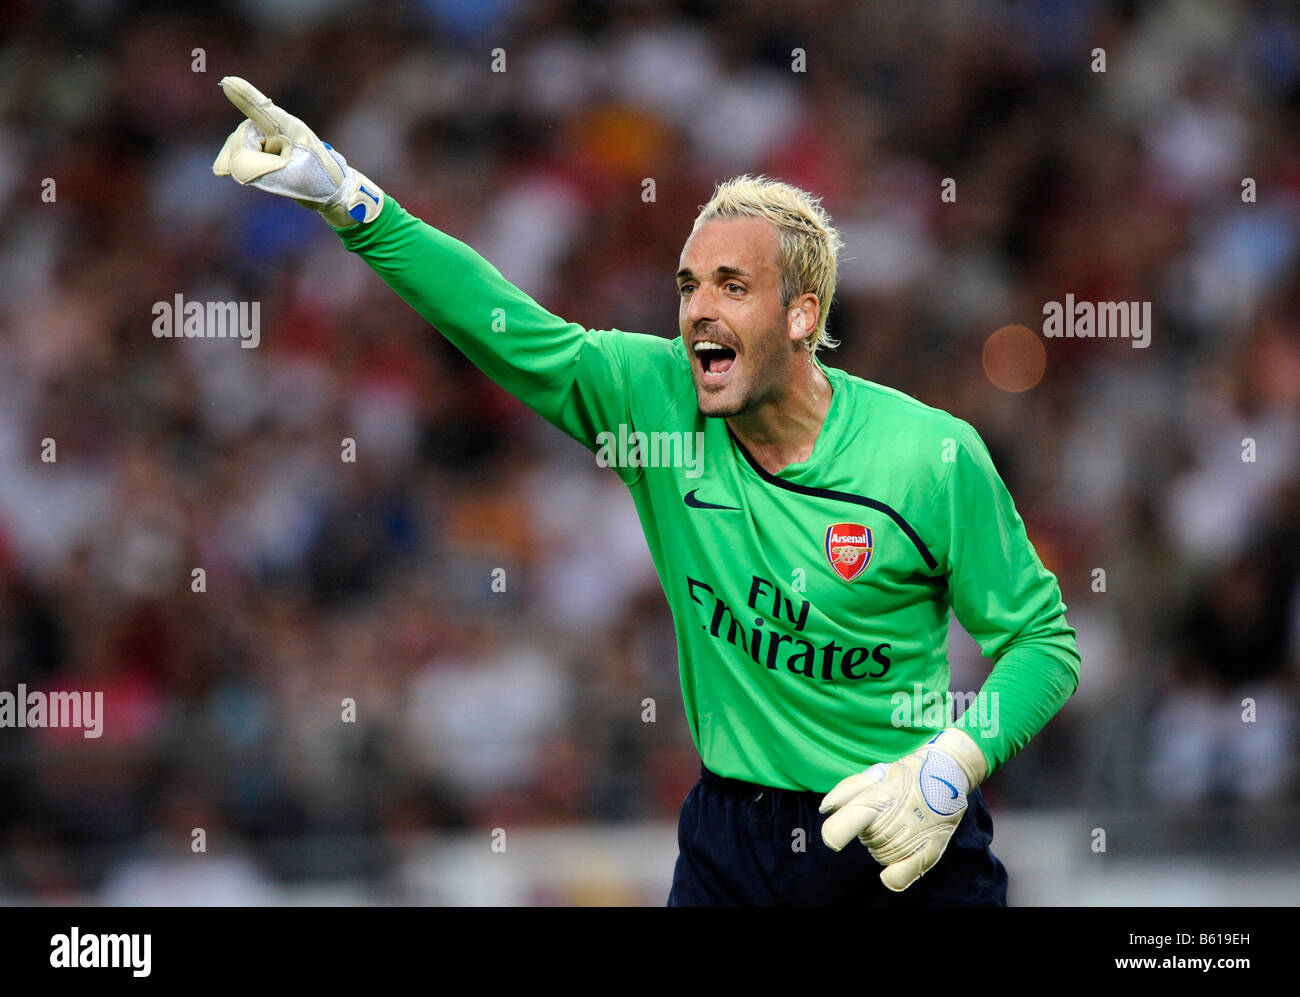 Goalkeeper Manual ALMUNIA, Arsenal FC London, directing the defence - Stock Image